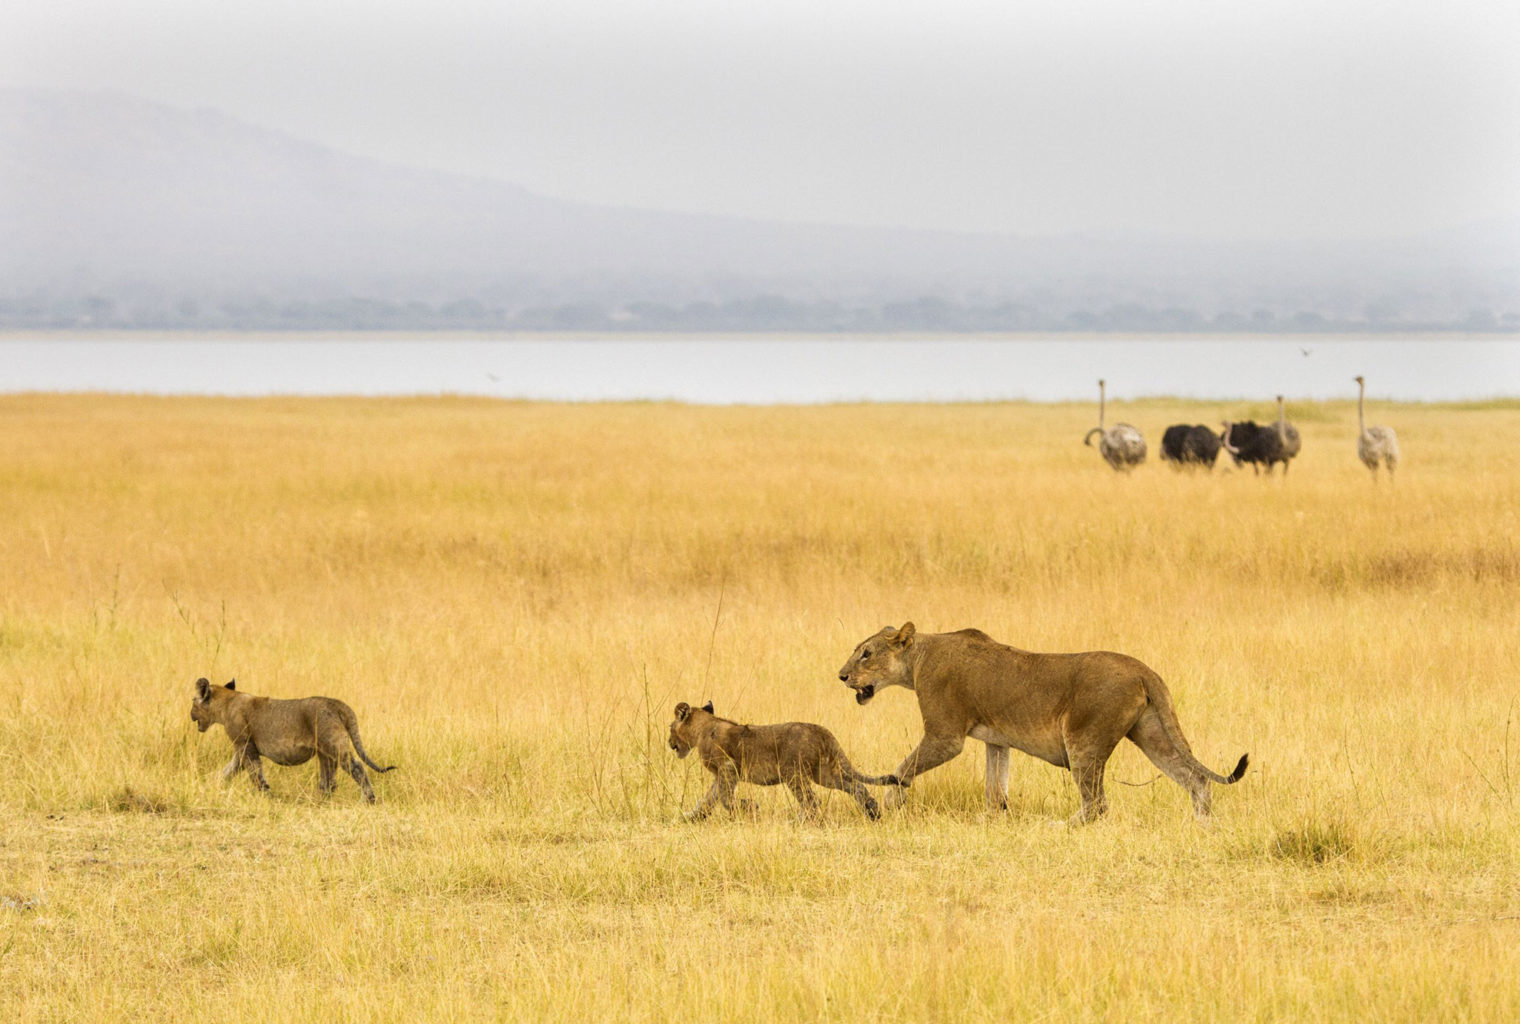 Little Chem Chem Tanzania Wildlife